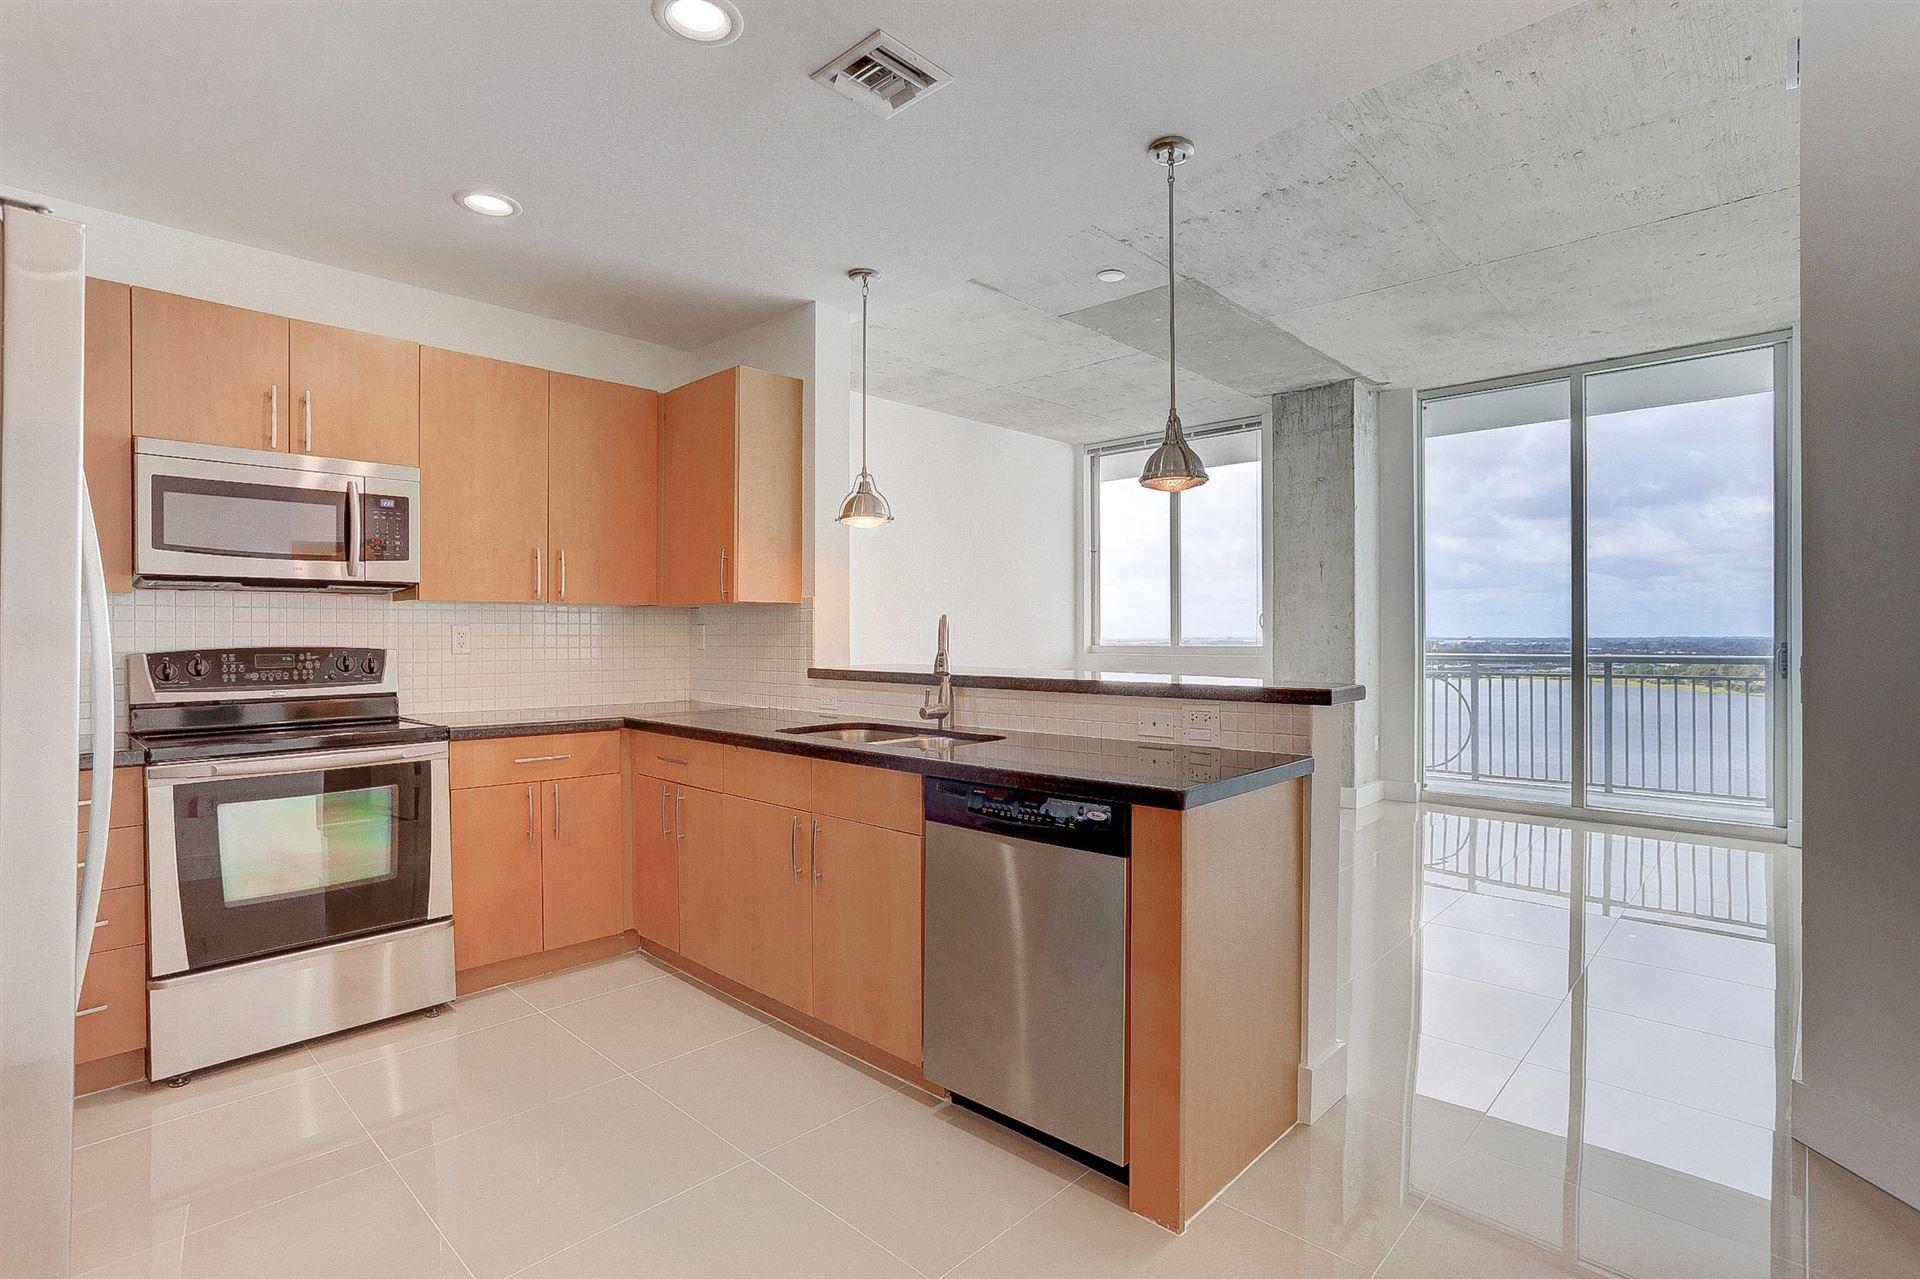 300 S Australian Avenue #1508, West Palm Beach, FL 33401 - MLS#: RX-10694863